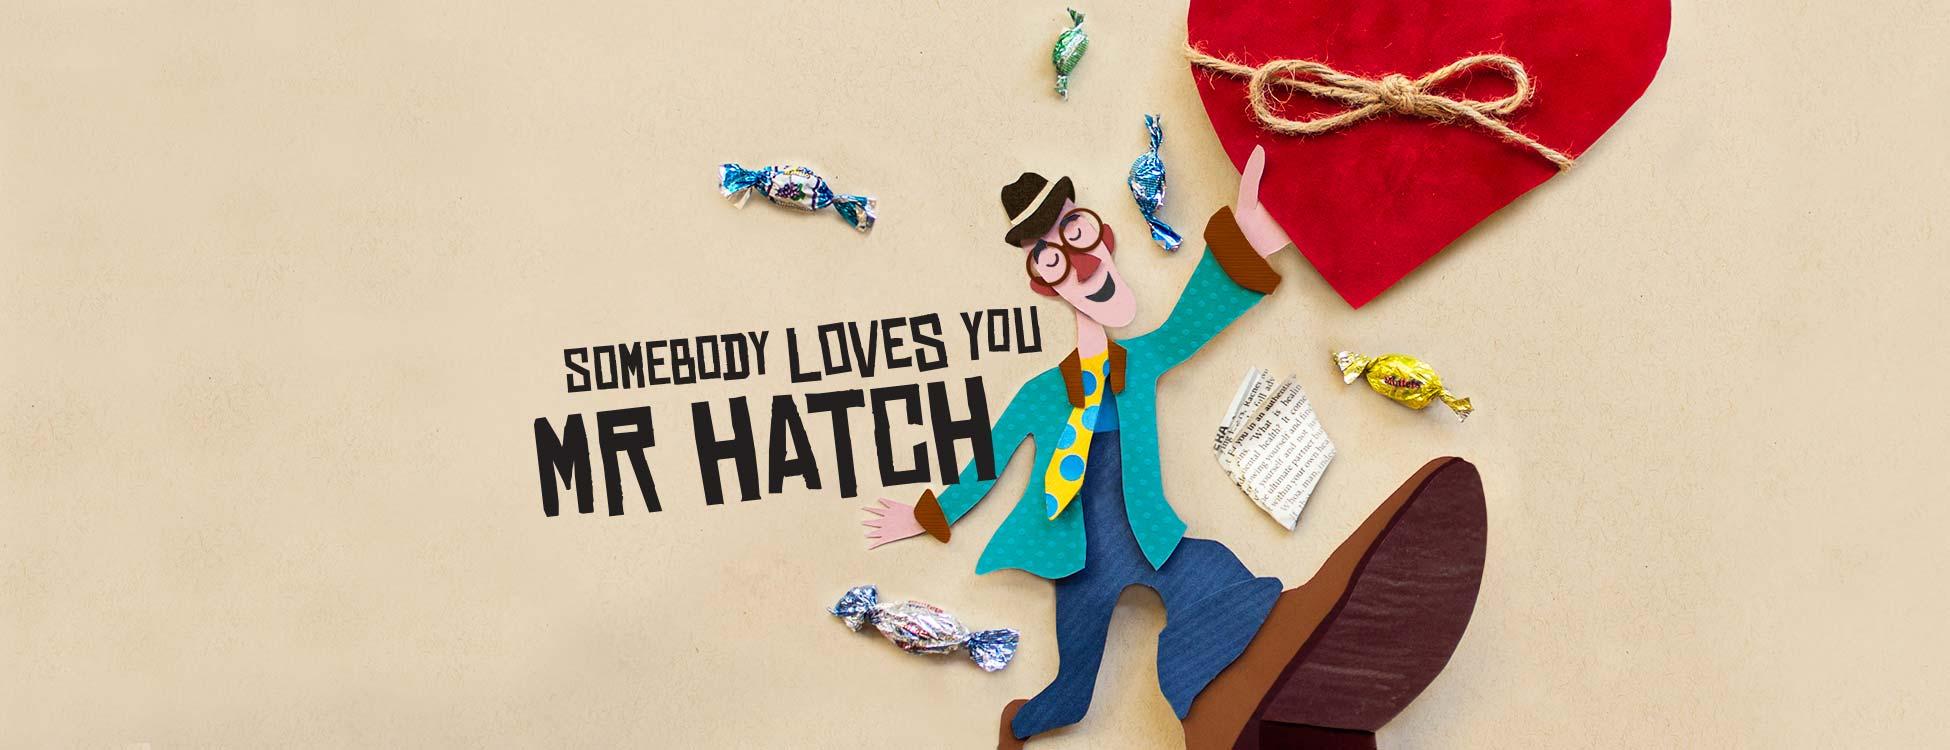 Somebody Loves You Mr. Hatch